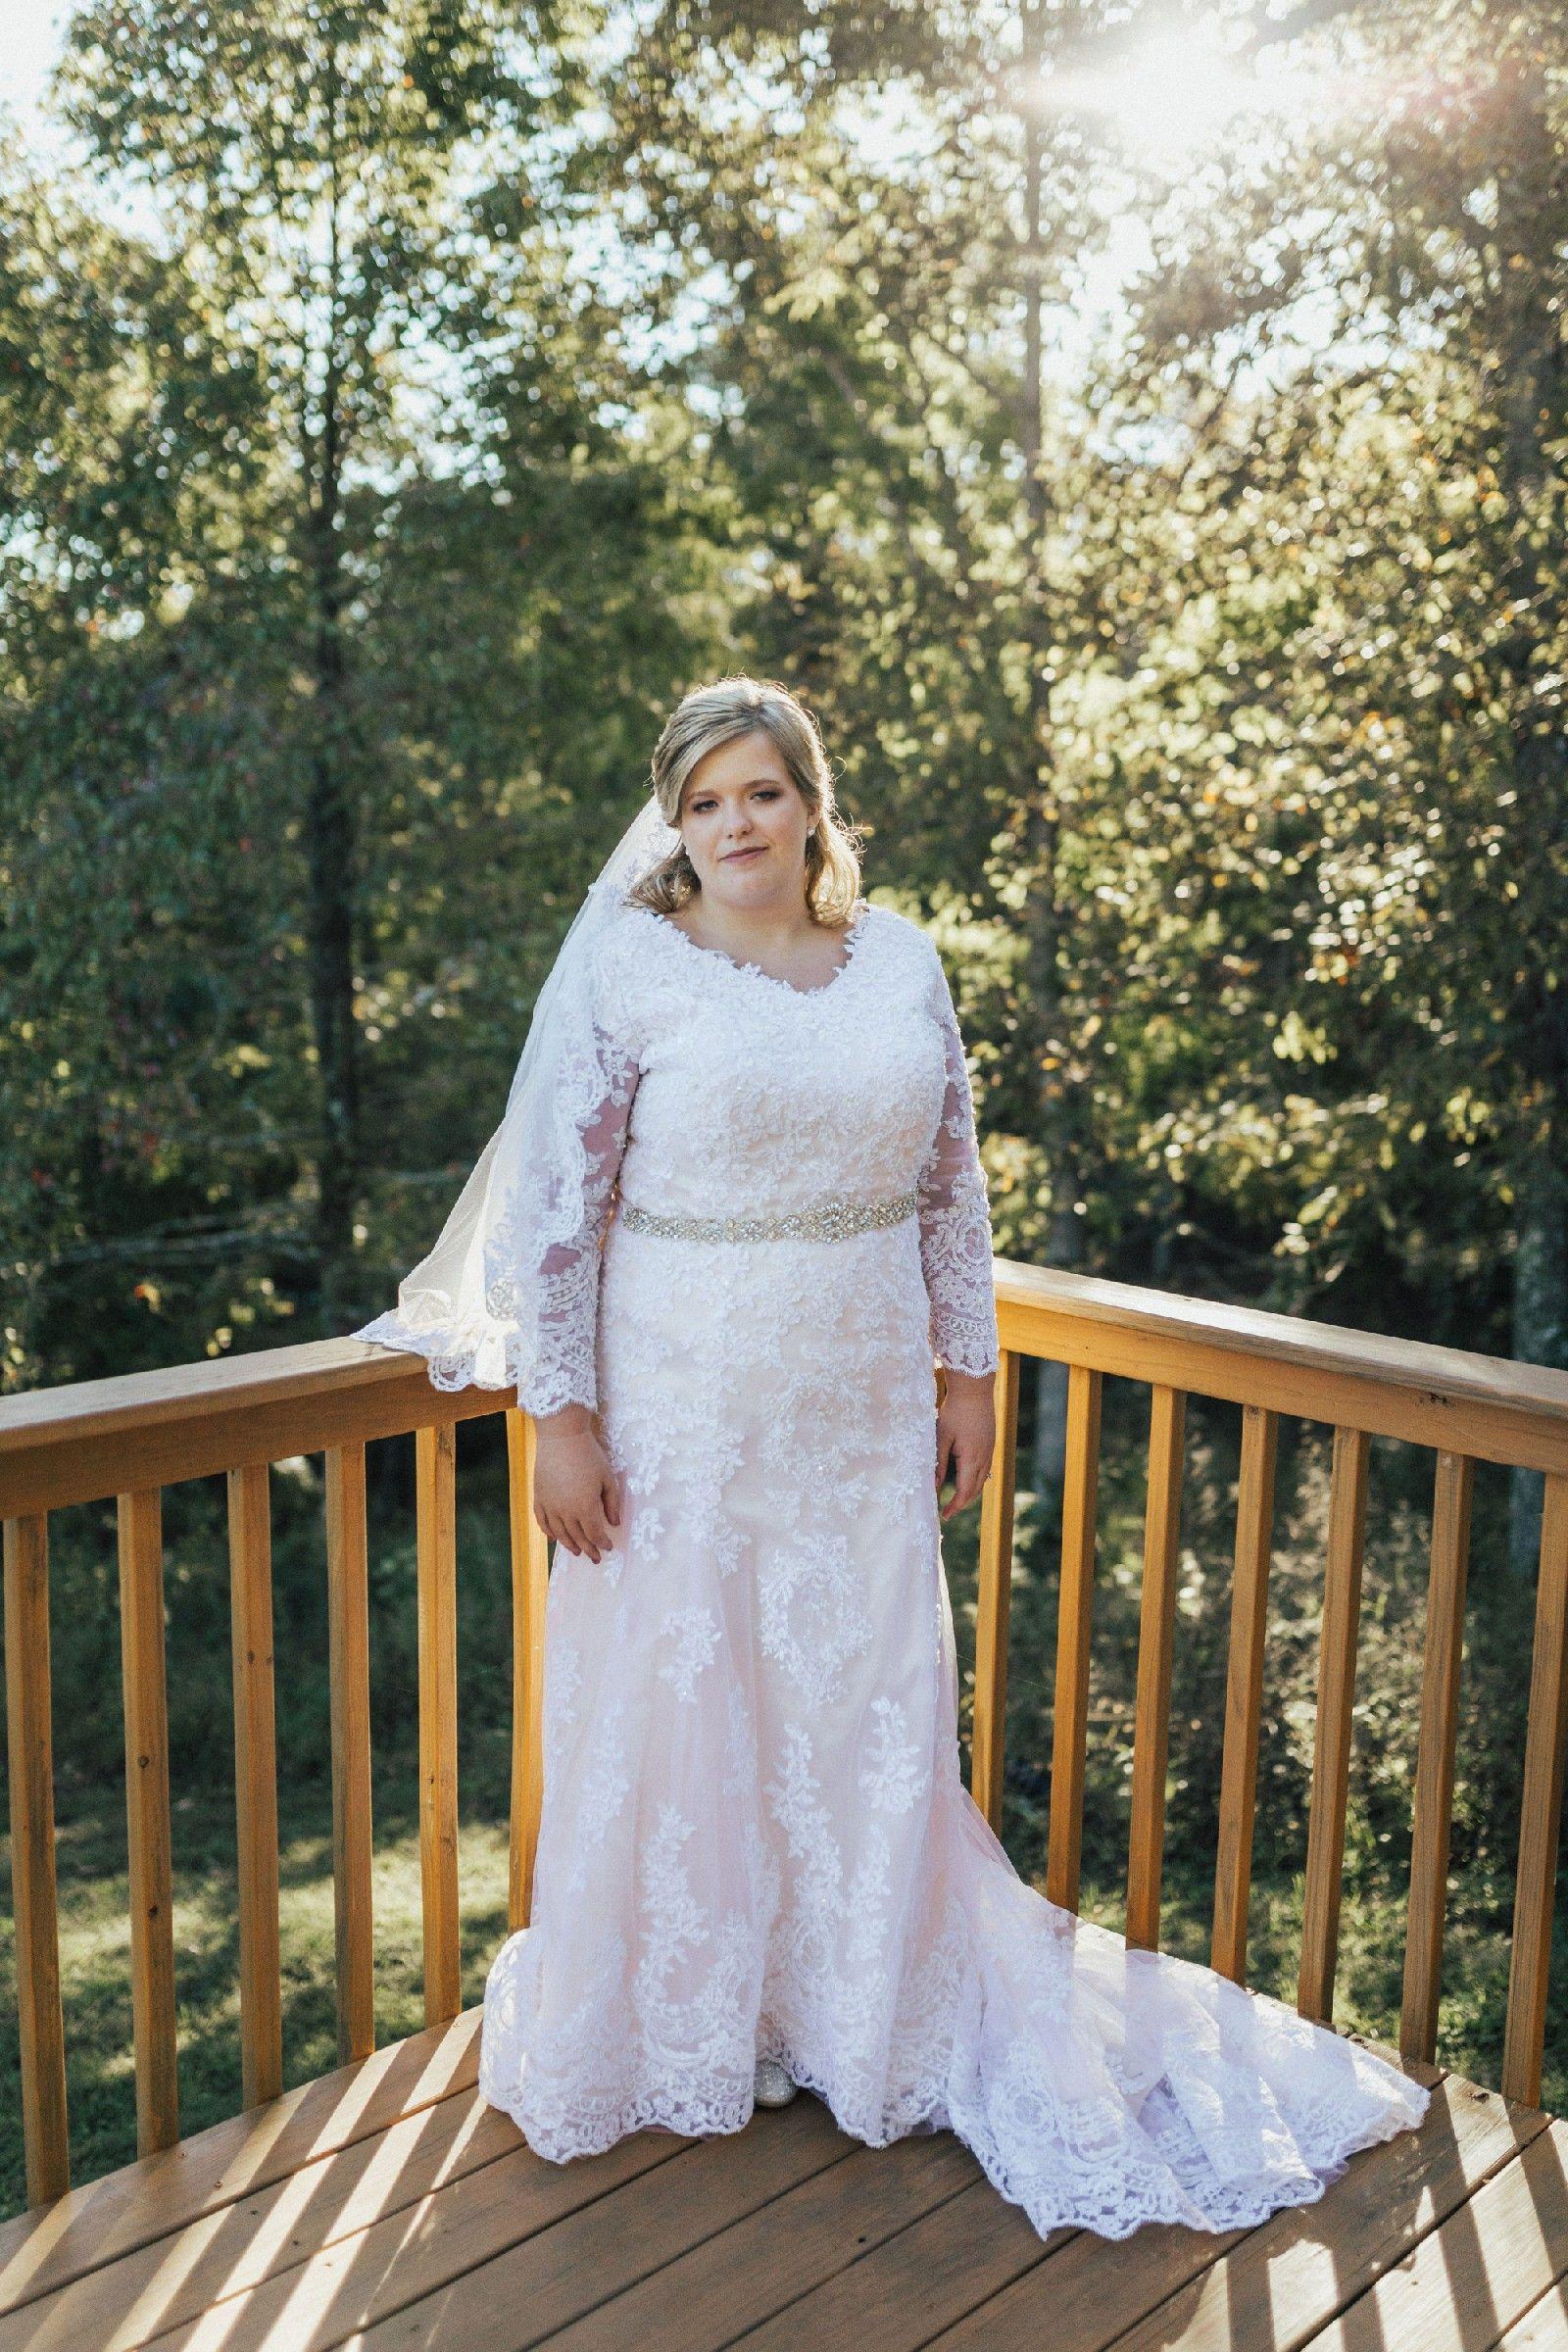 A Line Wedding Dress A Line Wedding Dress Conservative Wedding Dress Classic Wedding Dress